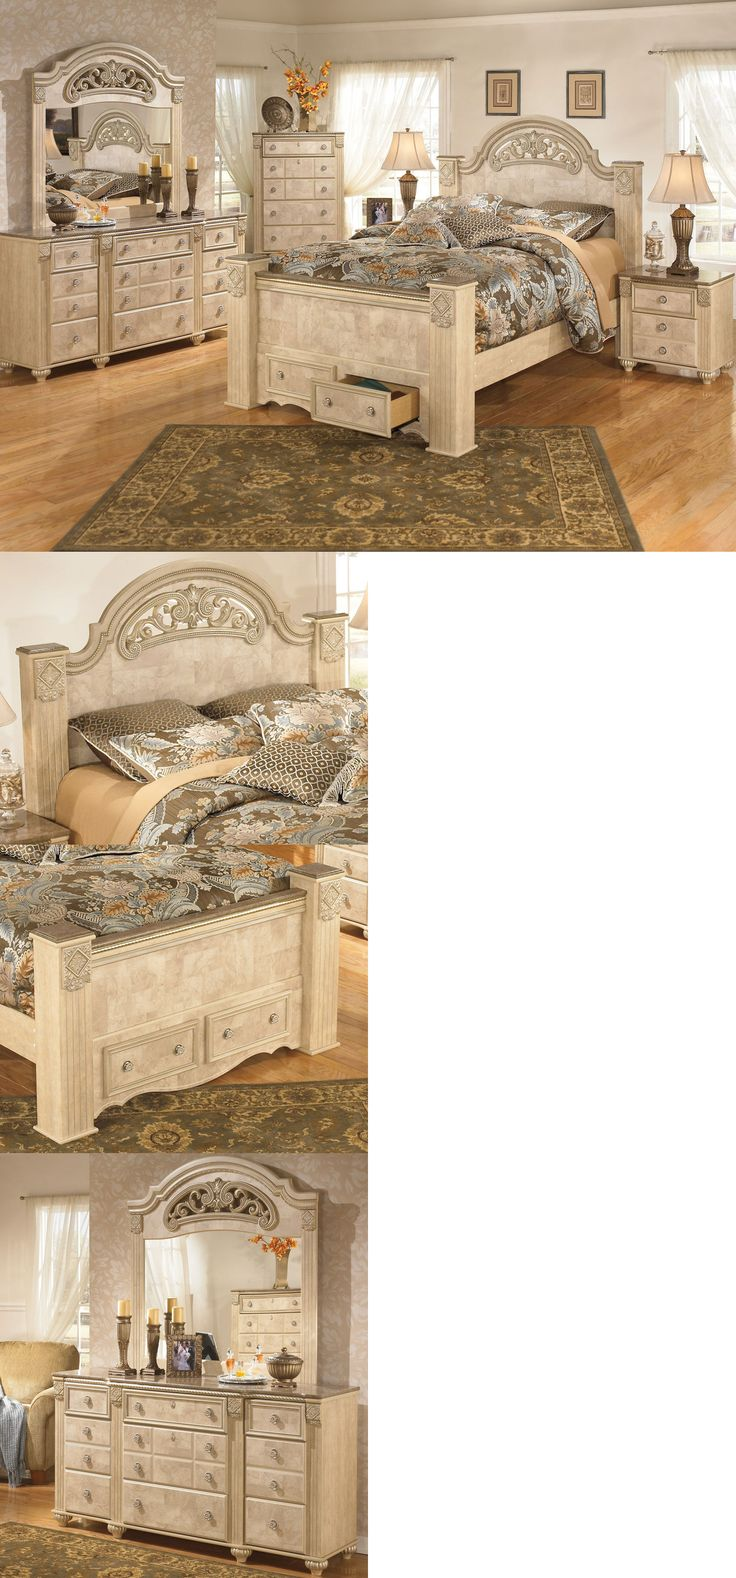 Bedroom Sets At Ashley Furniture 17 Best Ideas About Ashley Furniture Bedroom Sets On Pinterest